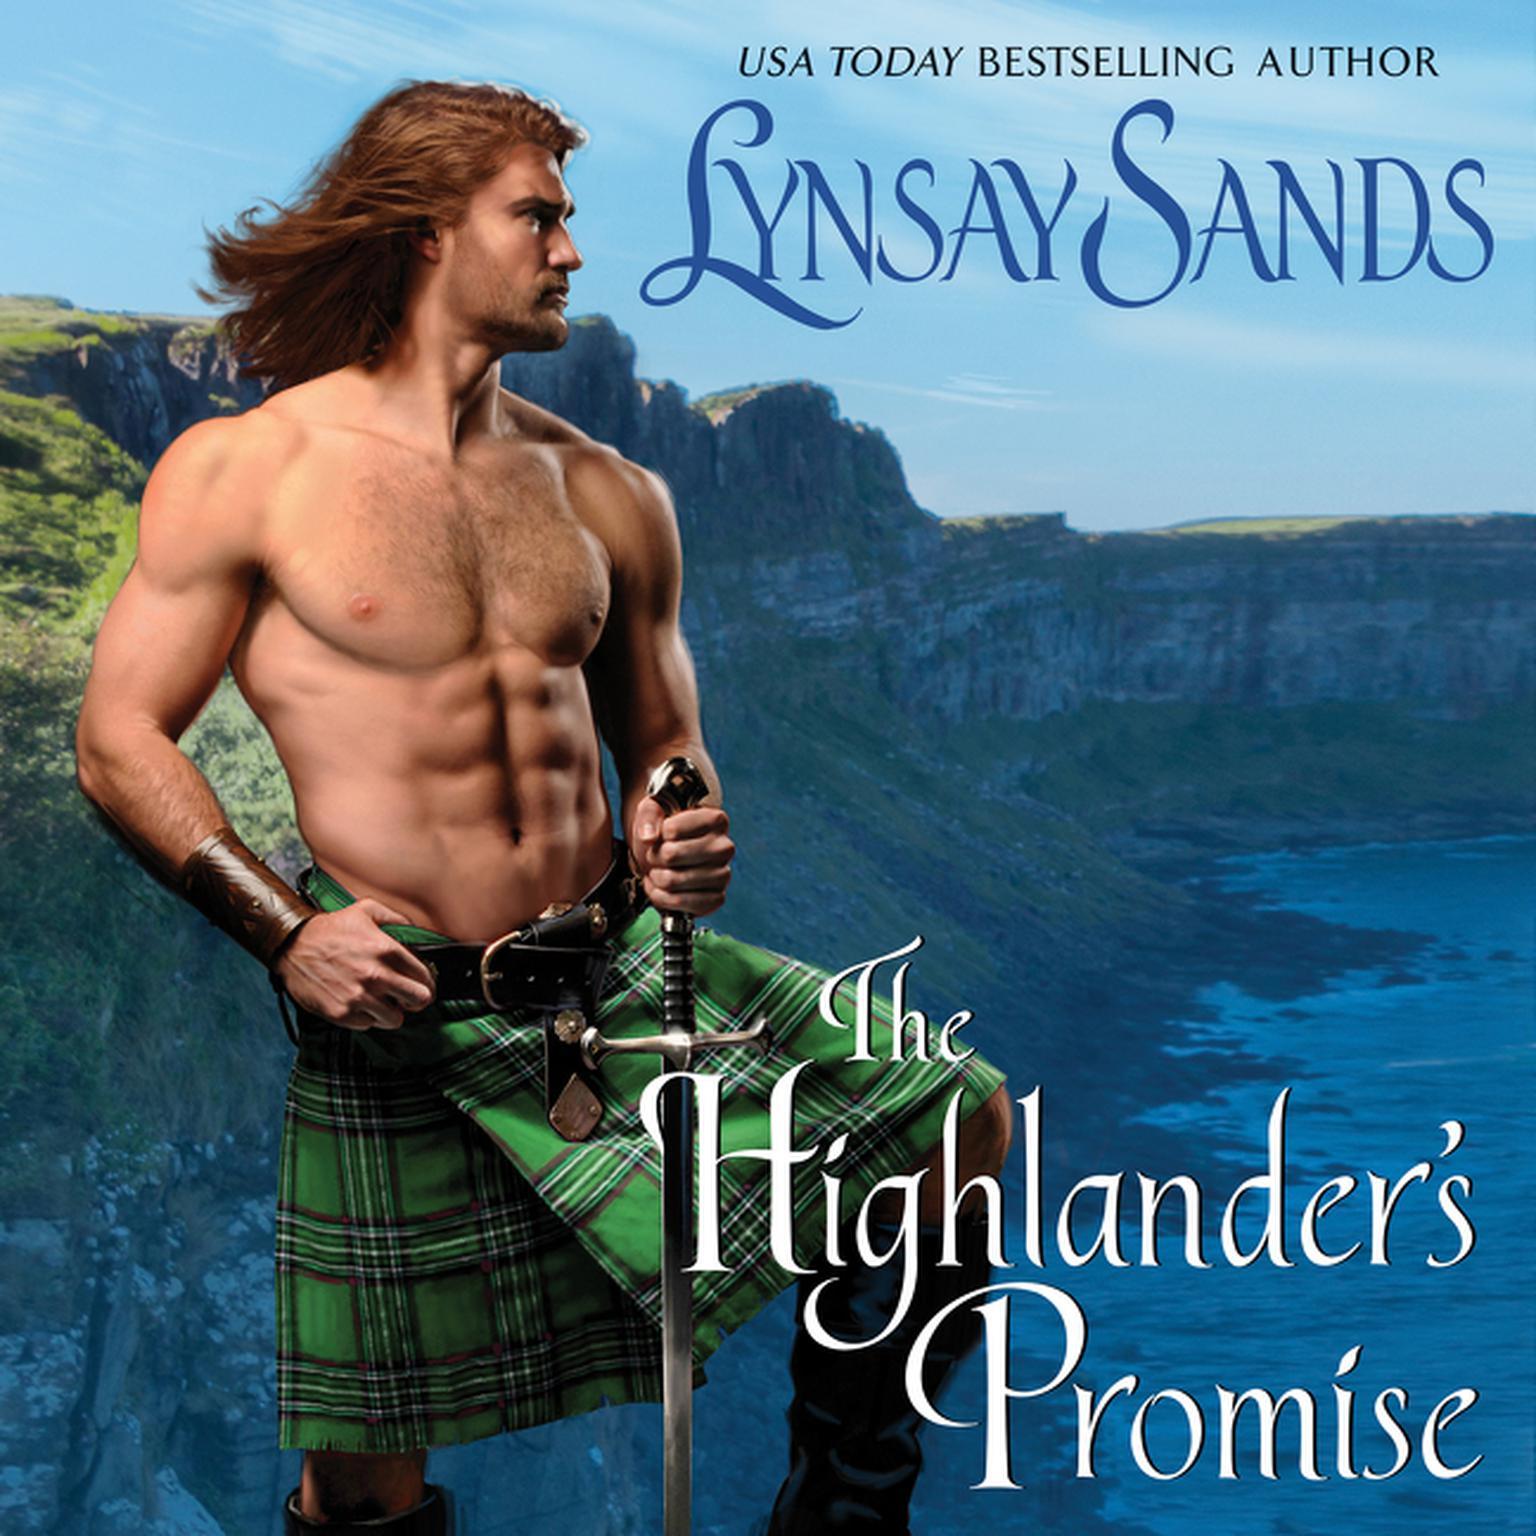 The Highlanders Promise: Higland Brides Audiobook, by Lynsay Sands